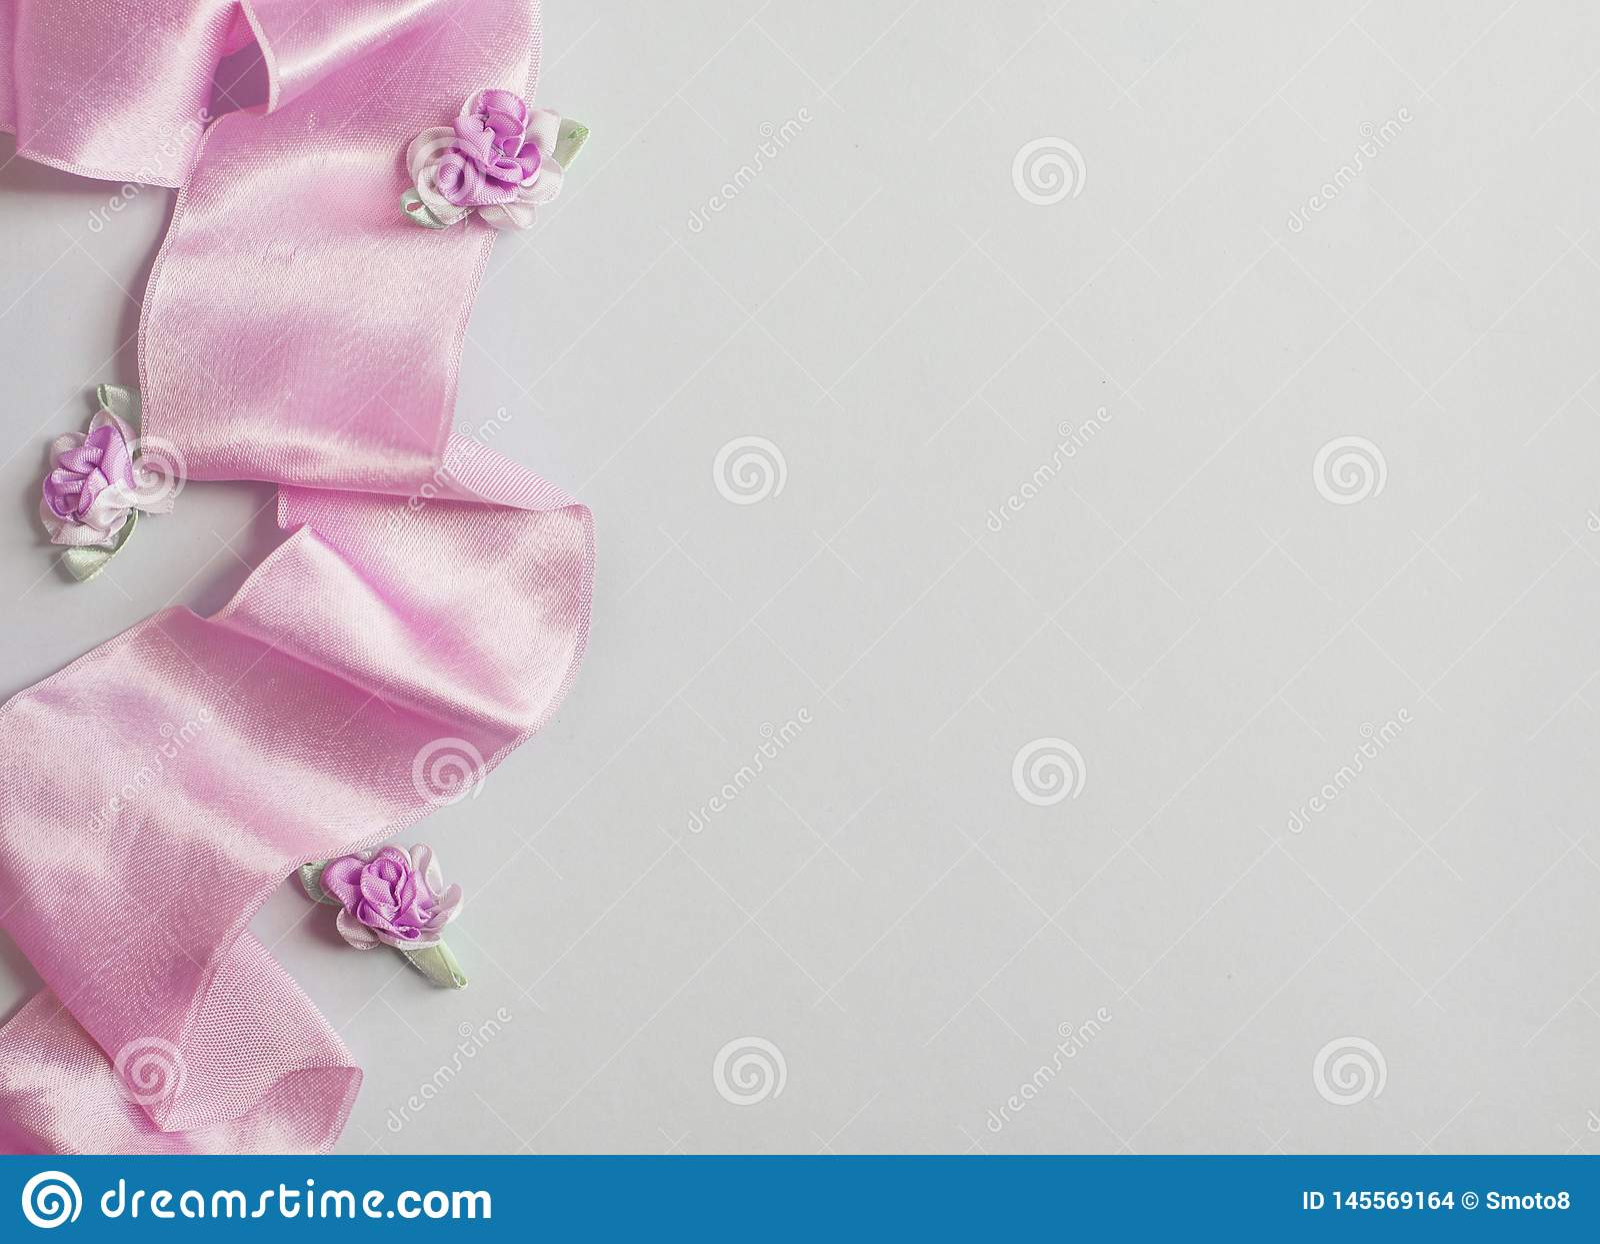 Styled stock photo. Feminine wedding desktop mockup with baby`s breath Gypsophila flowers, dry green eucalyptus leaves, satin